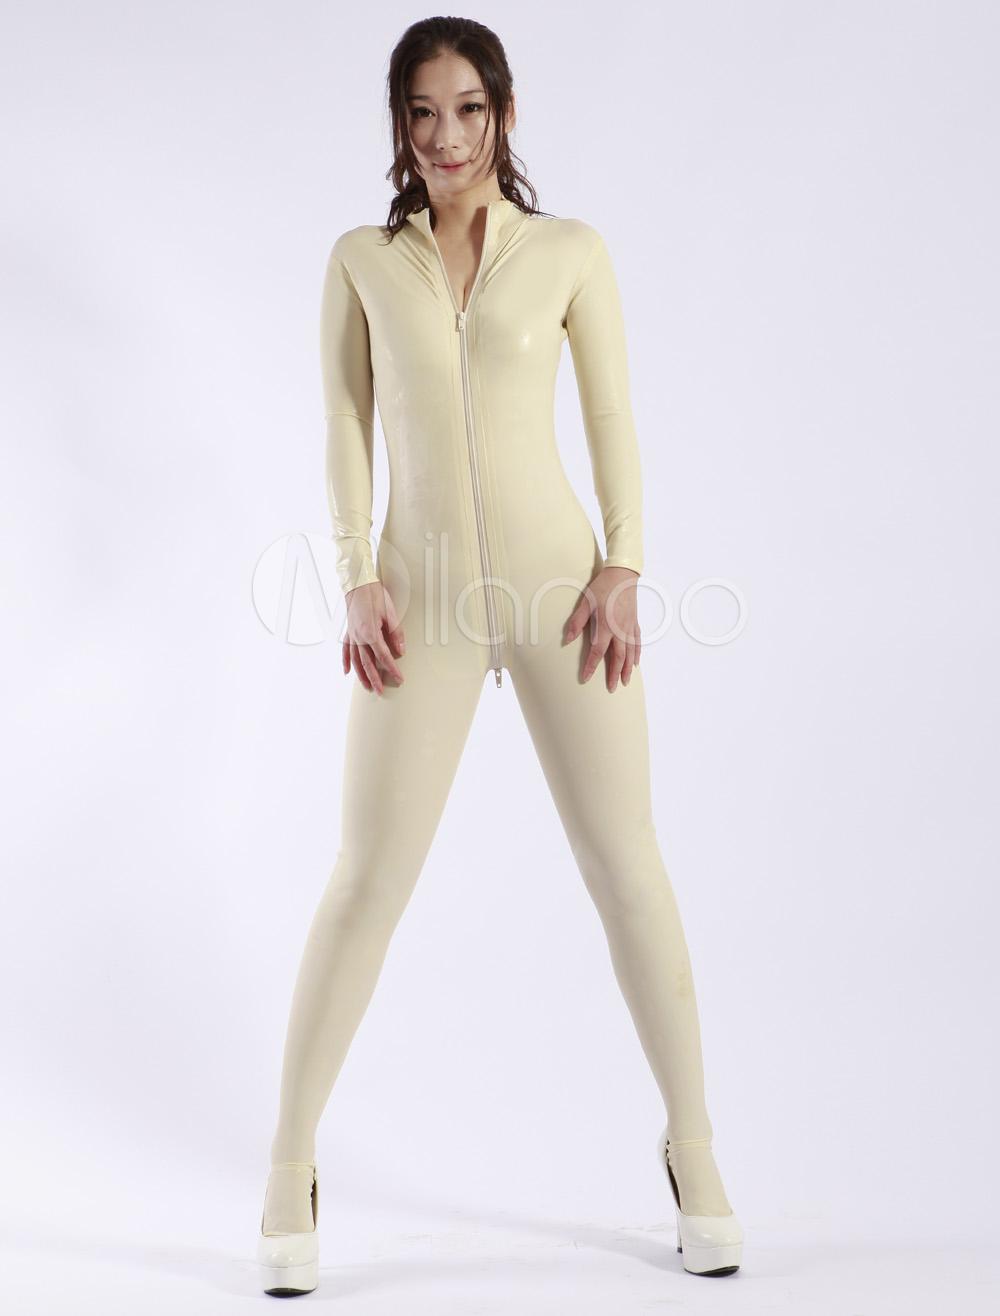 Halloween Fashion White Zipper Women's Latex Catsuits Halloween